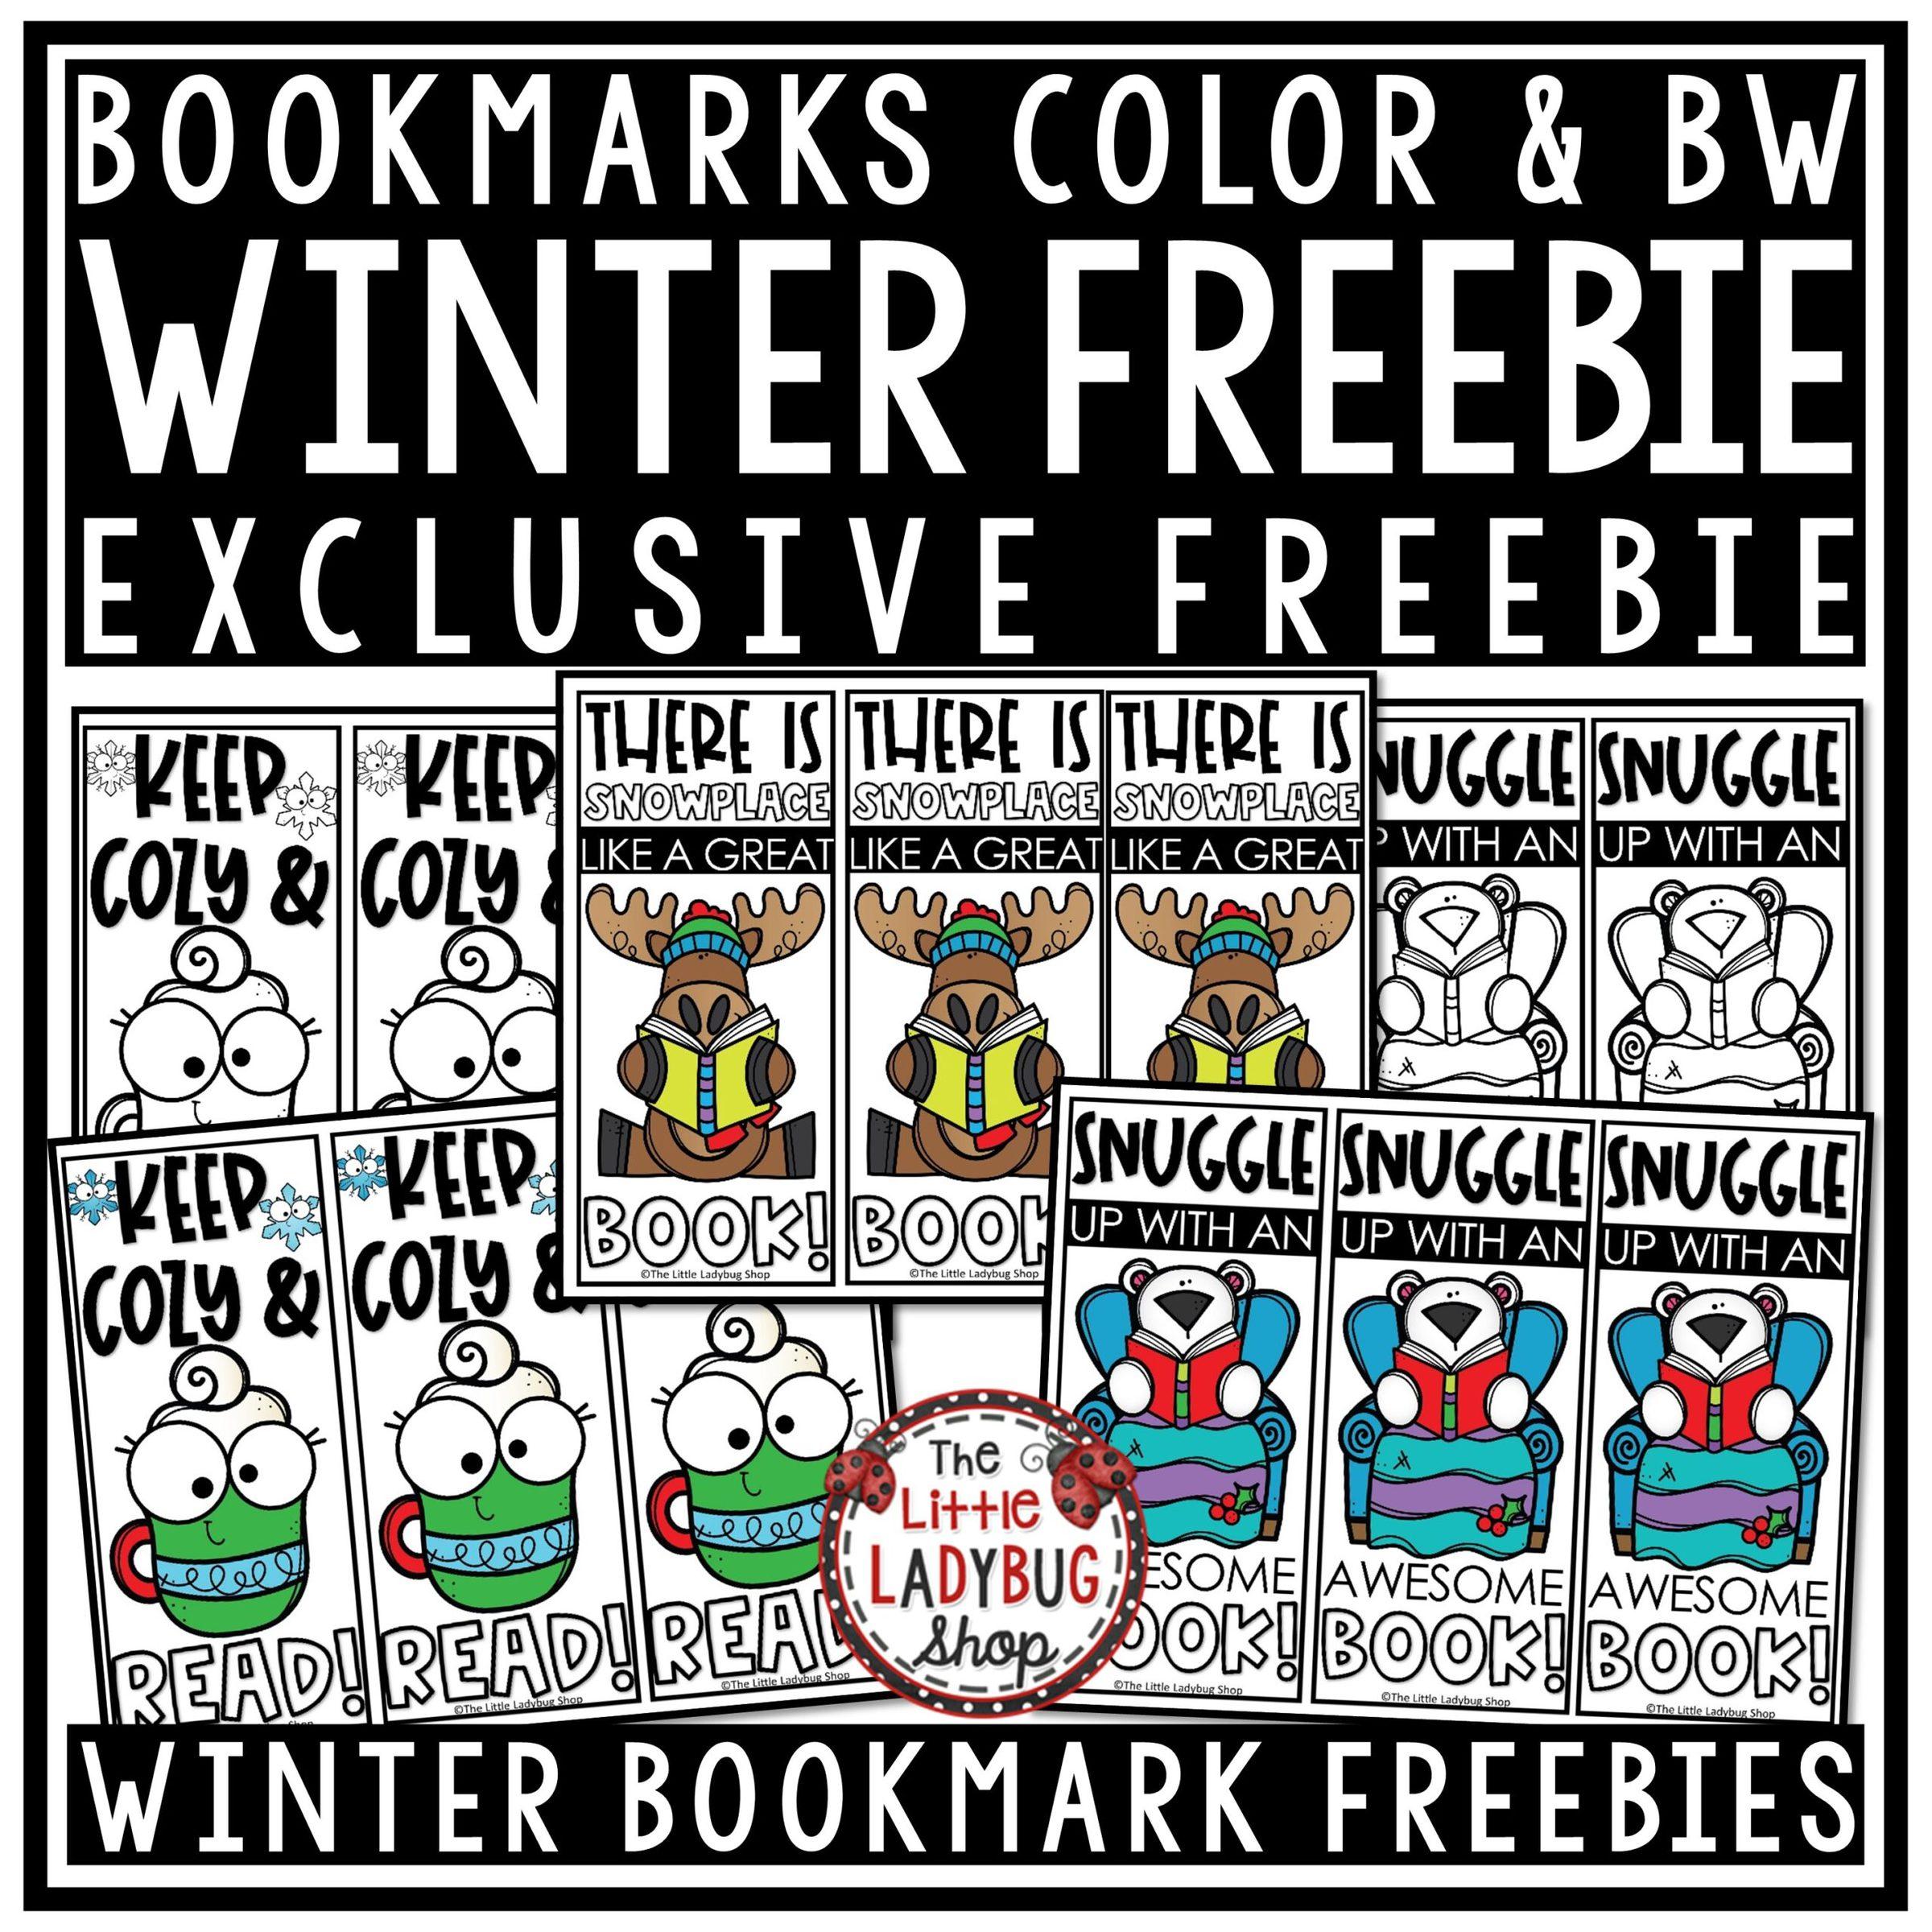 Winter Freebie Available January